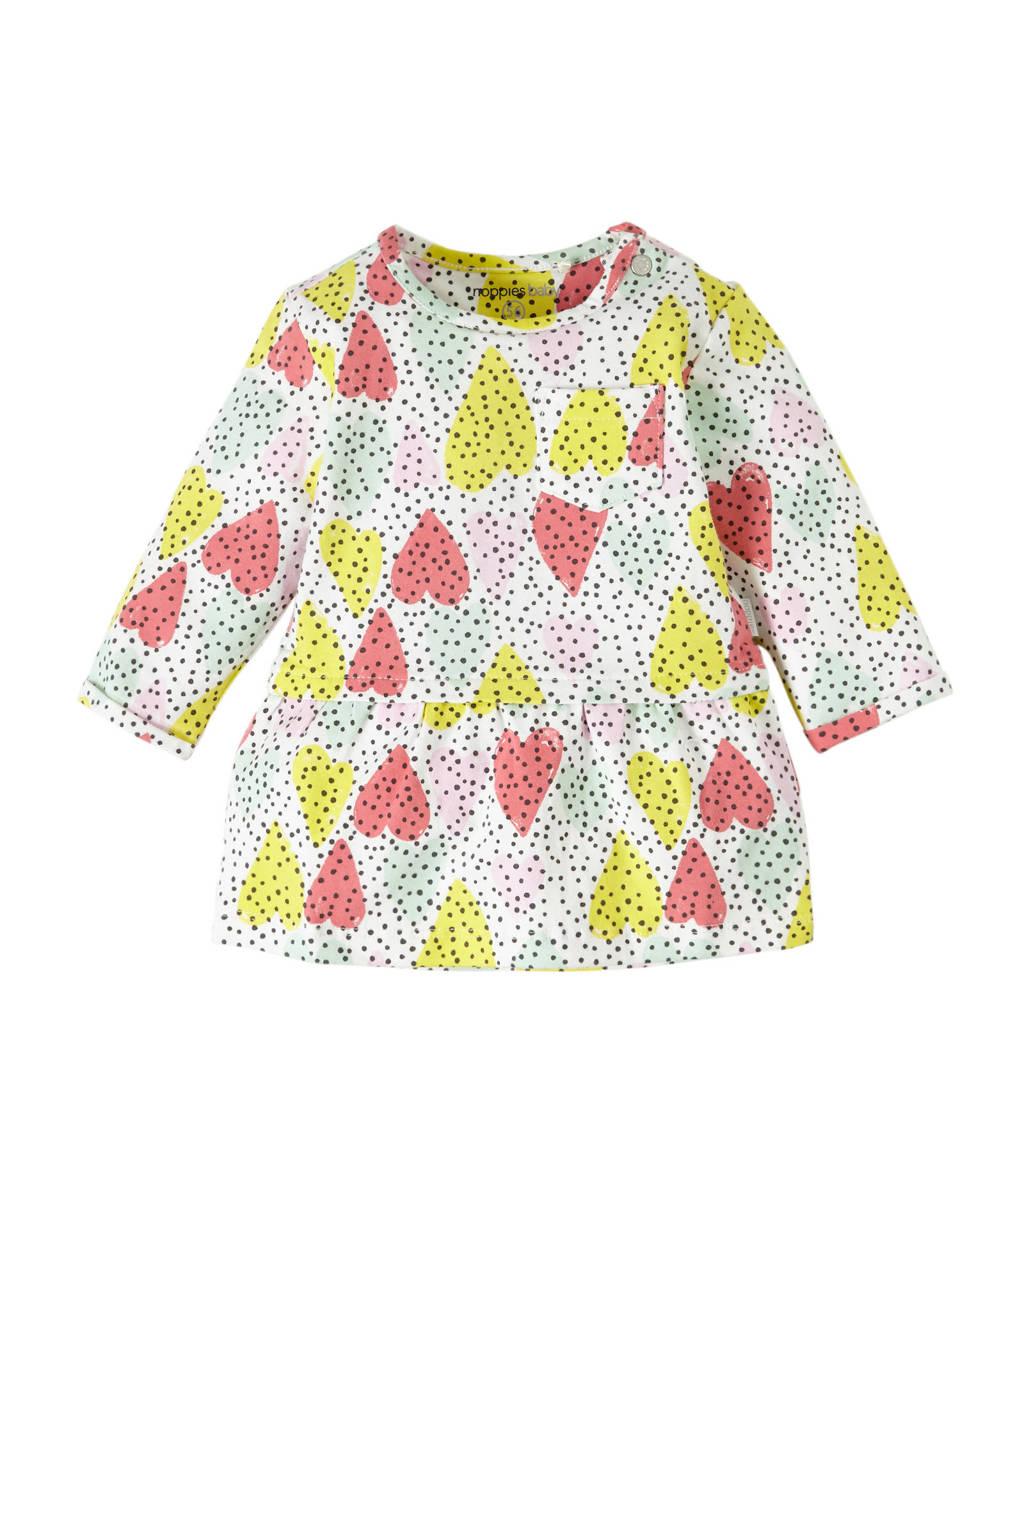 Noppies baby jurk, Roze/ geel/ groen/ off white